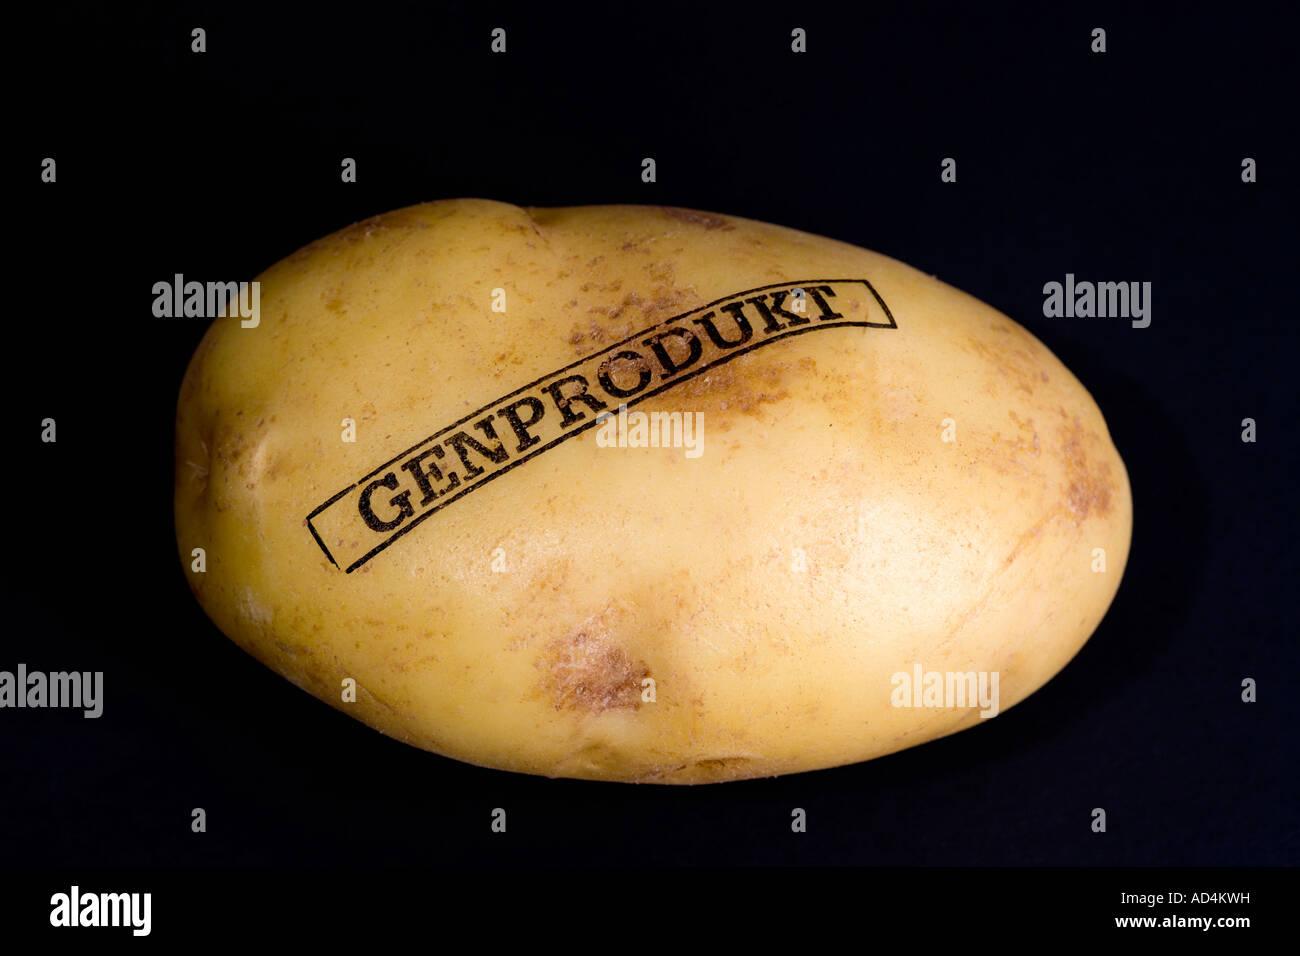 A genetically modified potato - Stock Image